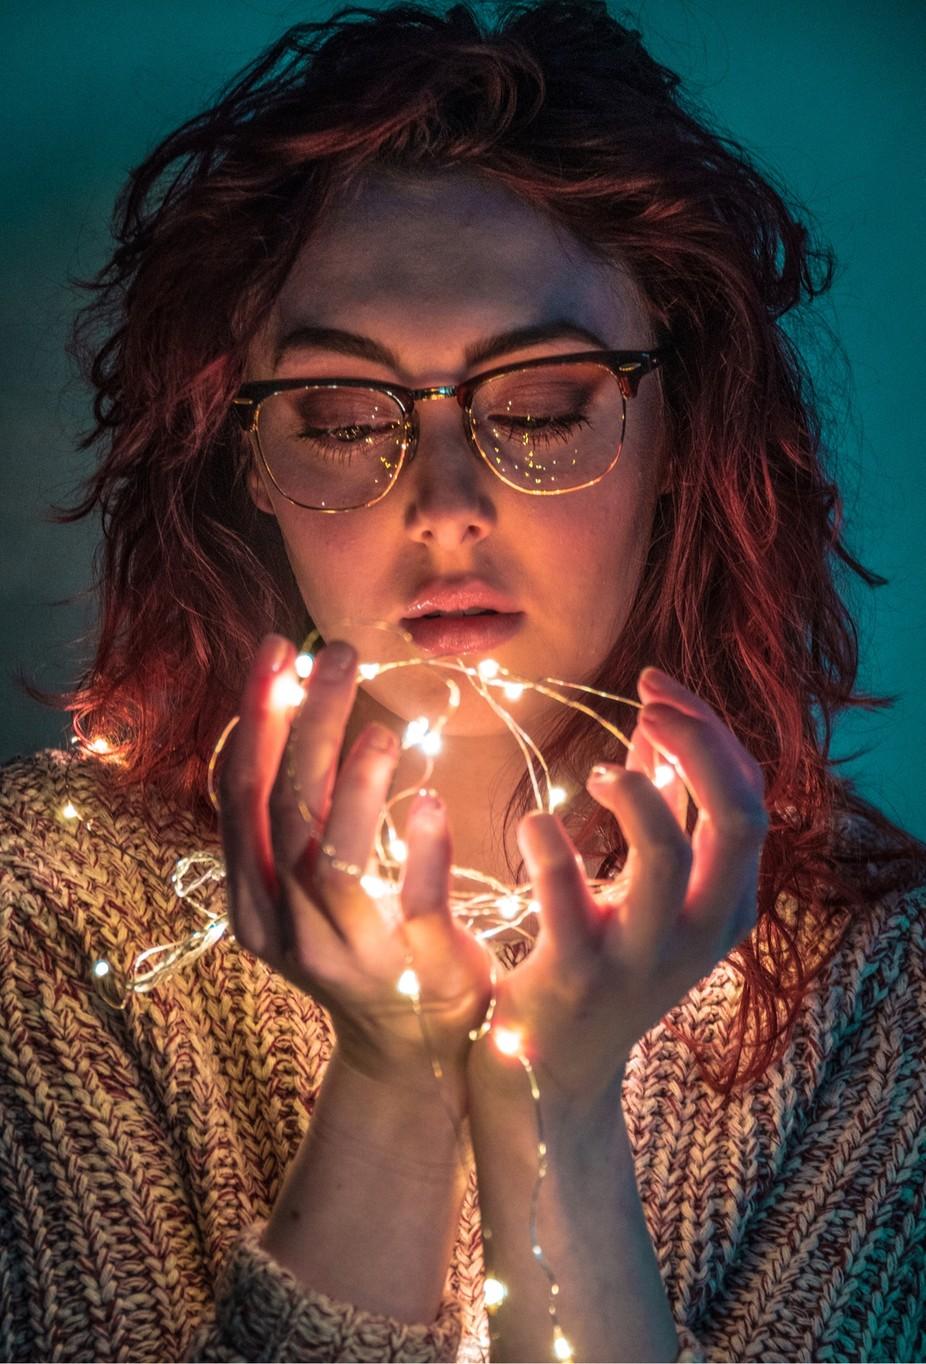 Fairylight Portrait by JonniePetherbridge - Holiday Lights Photo Contest 2017